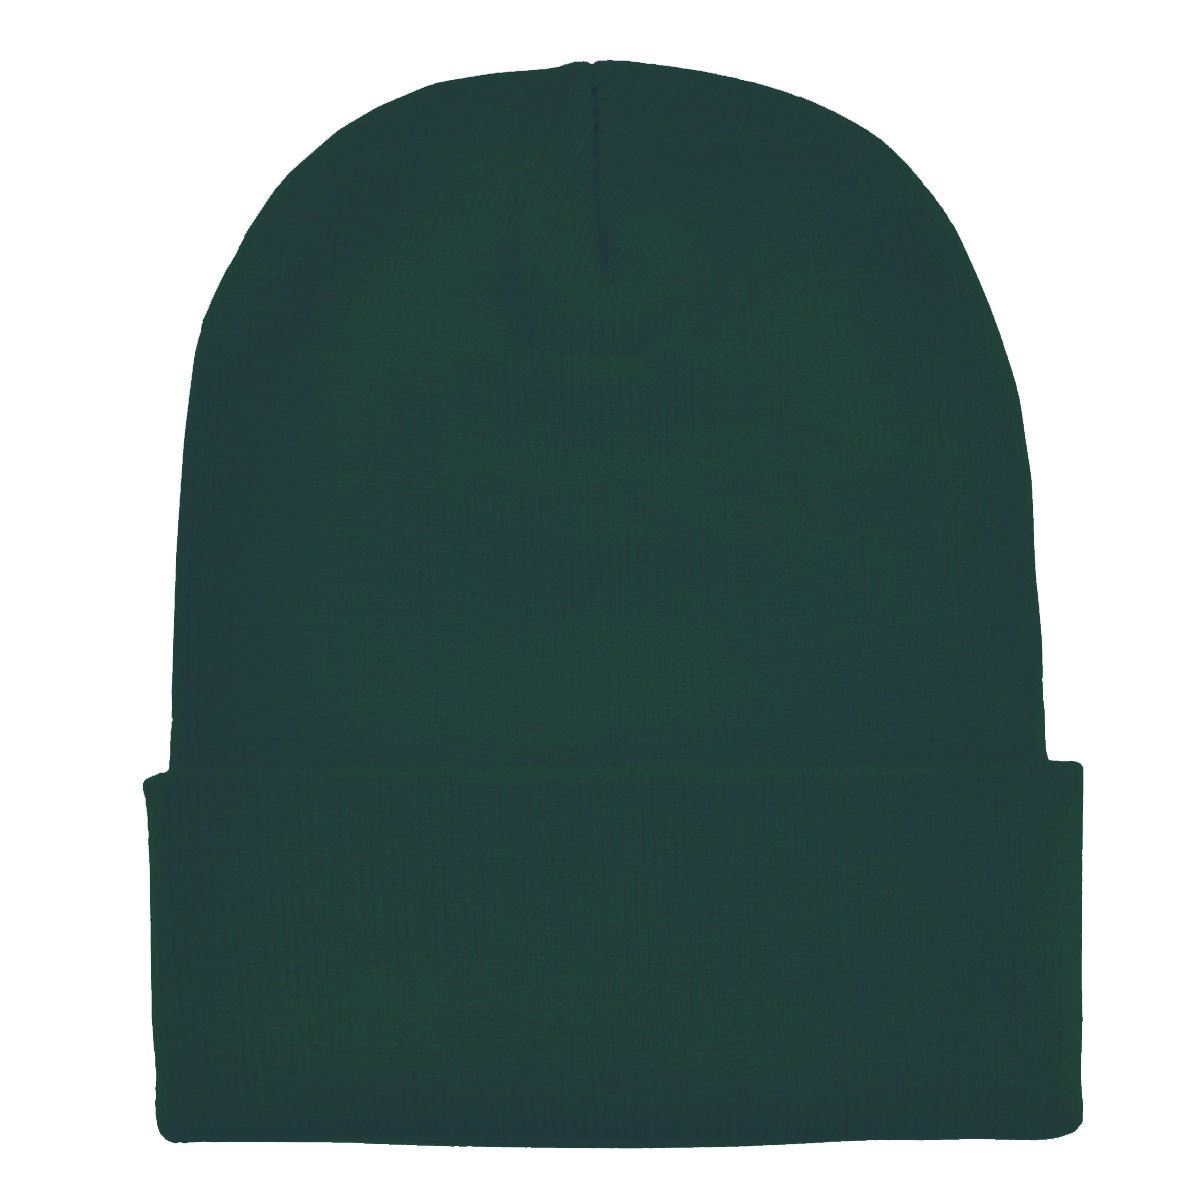 DonDon gorro de invierno gorro de abrigo diseño clásico moderno y suave  MUE100 59436420e69